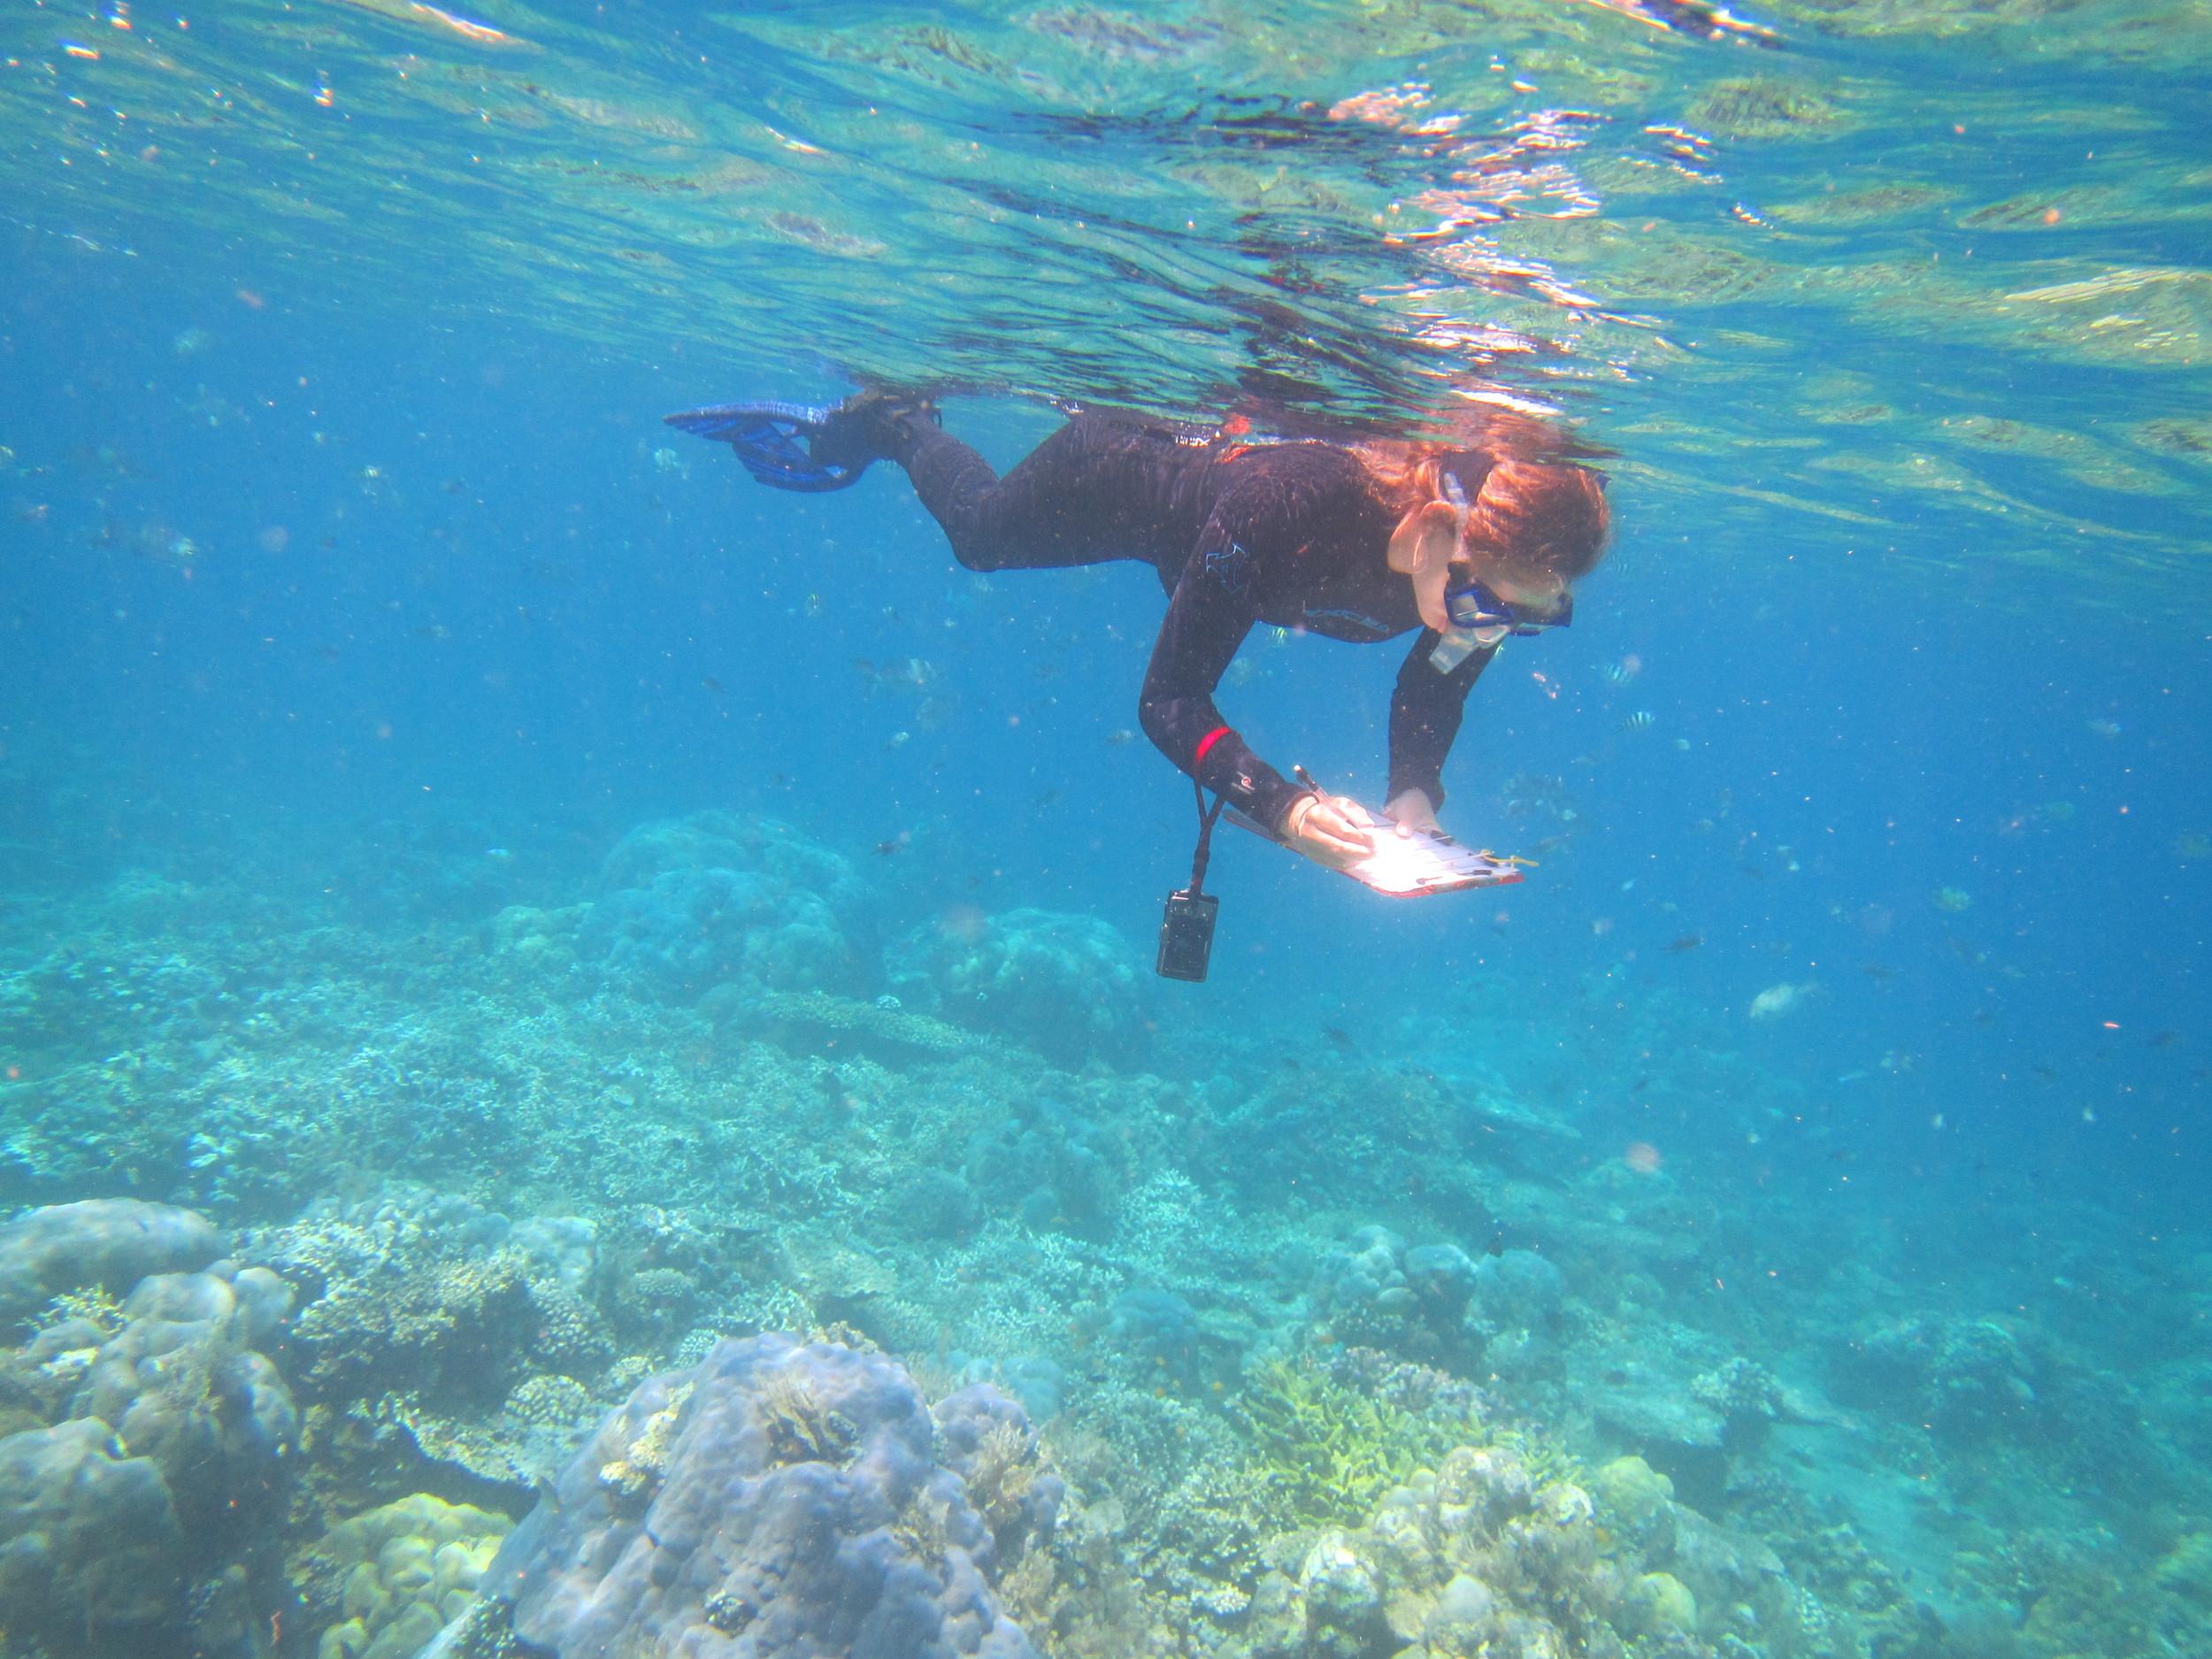 Conducting surveys in Bali